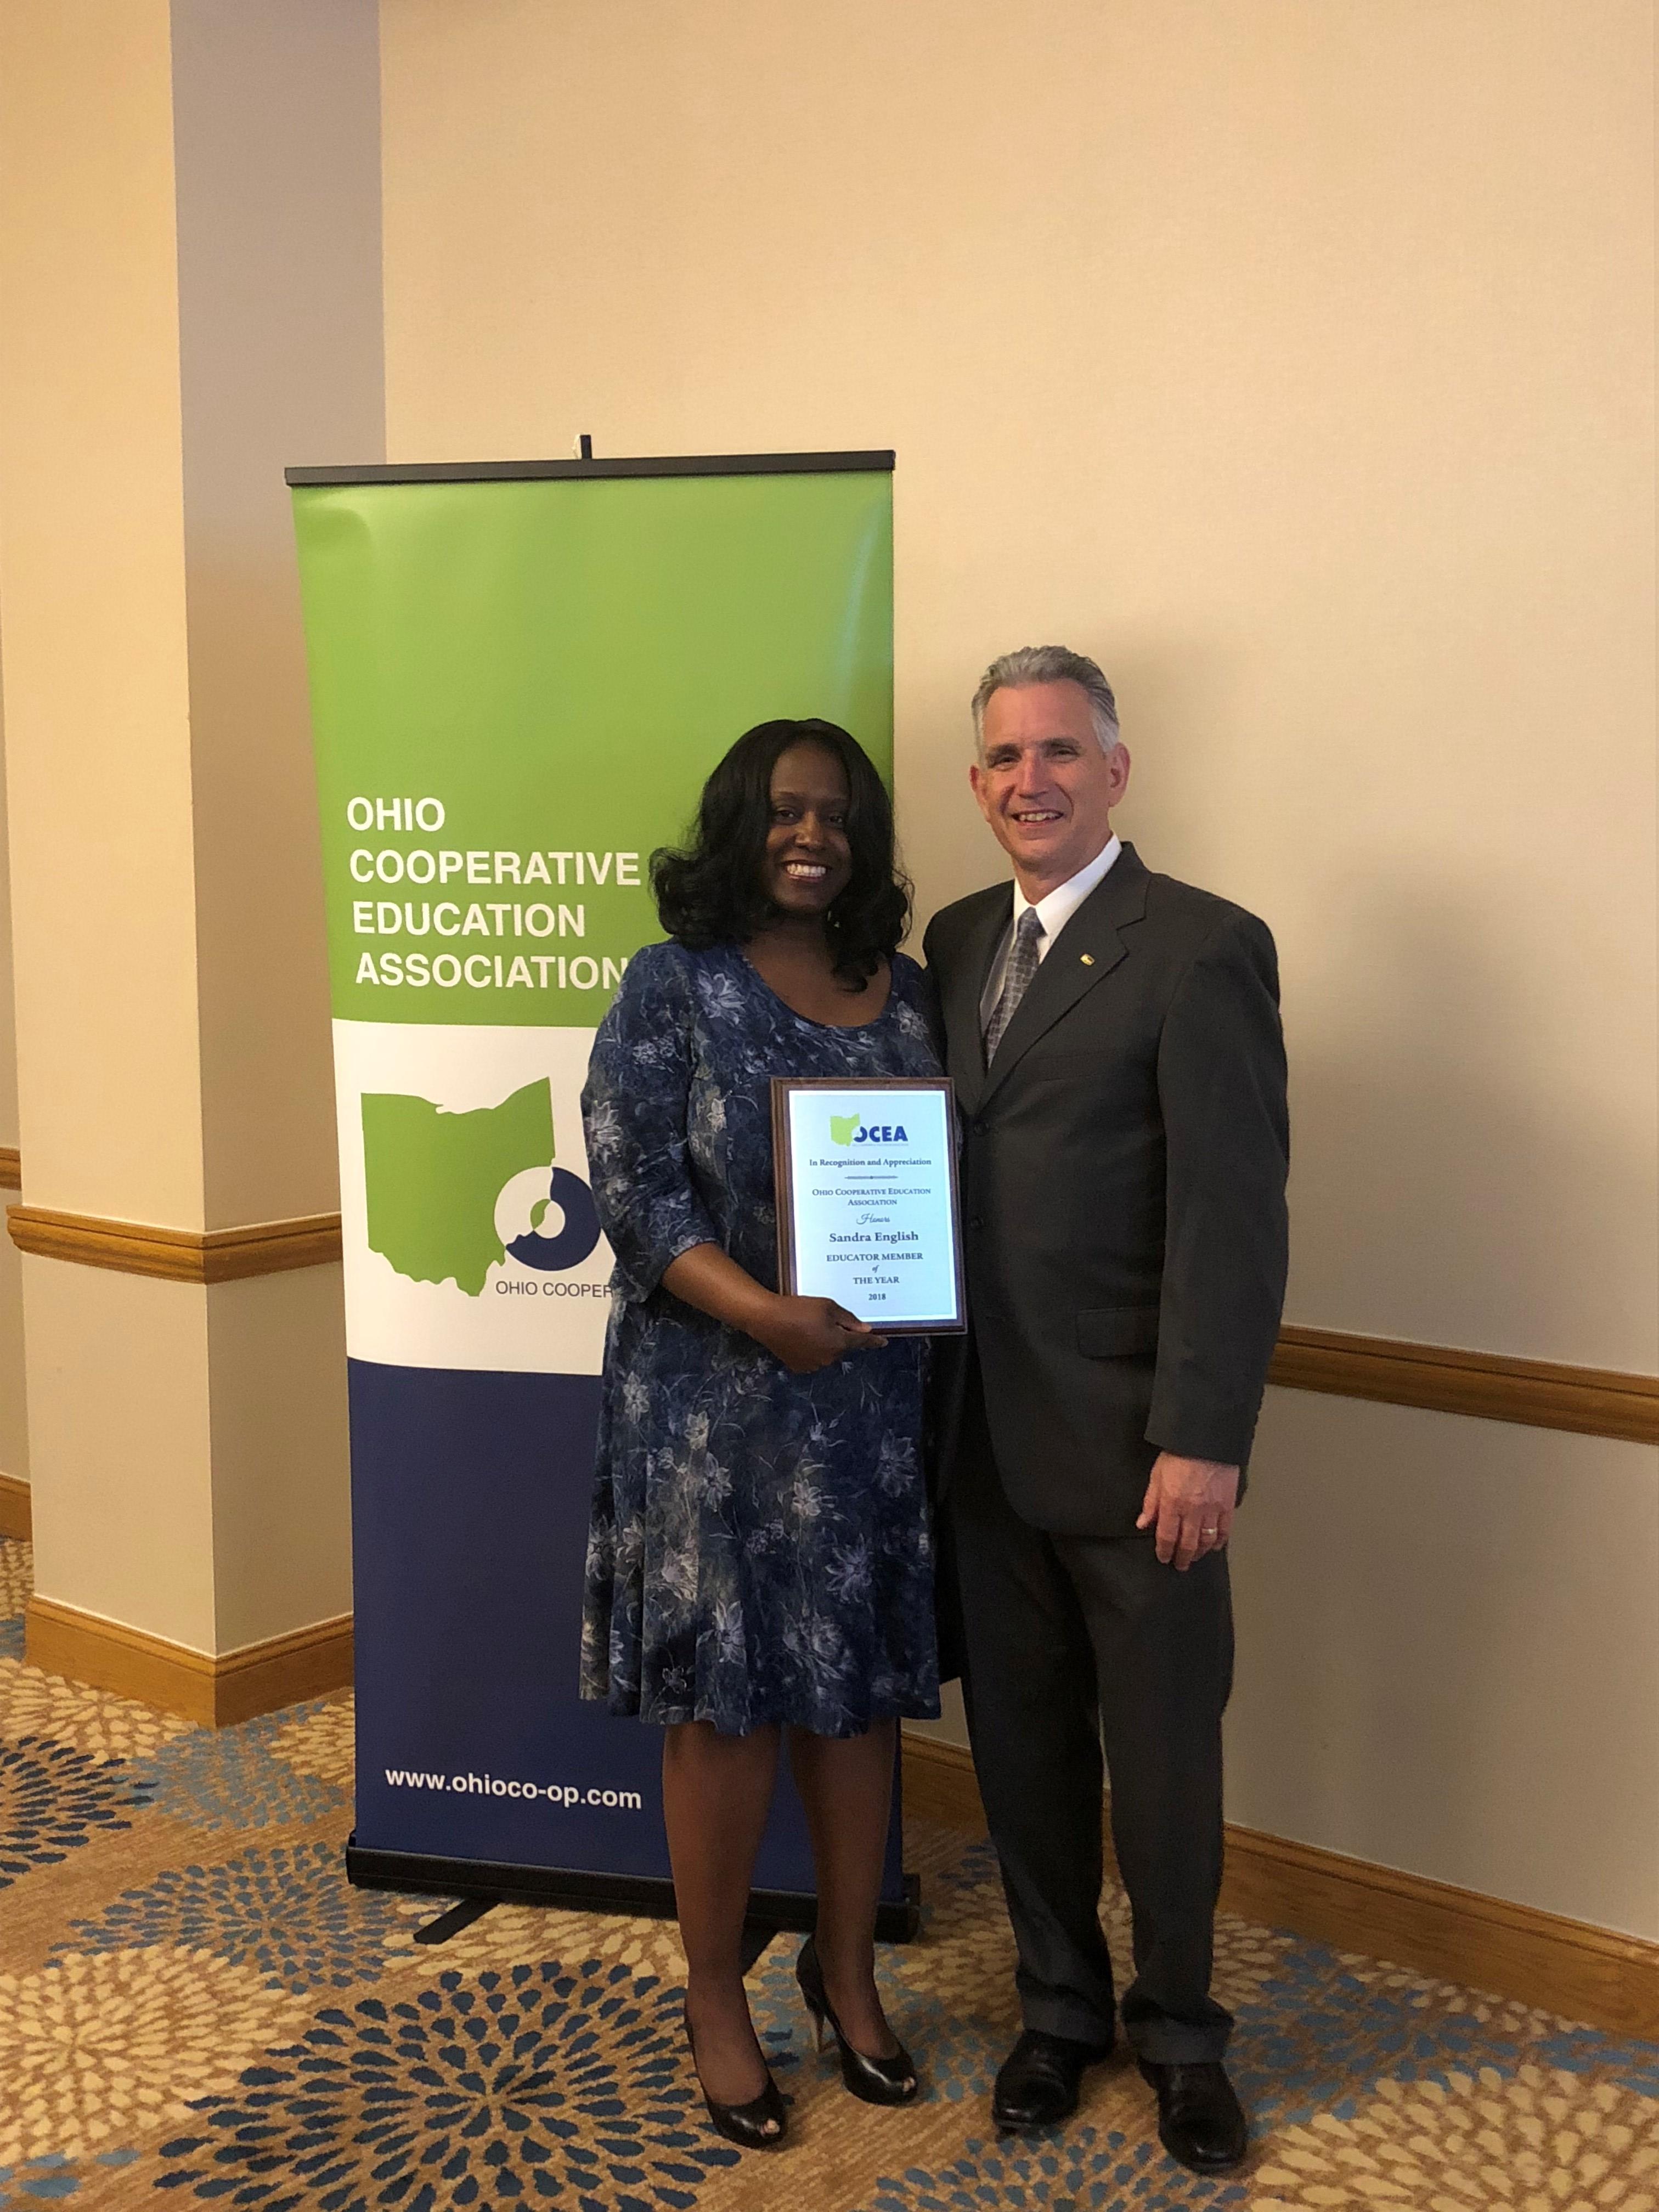 Sandra English, OCEA Educator Award